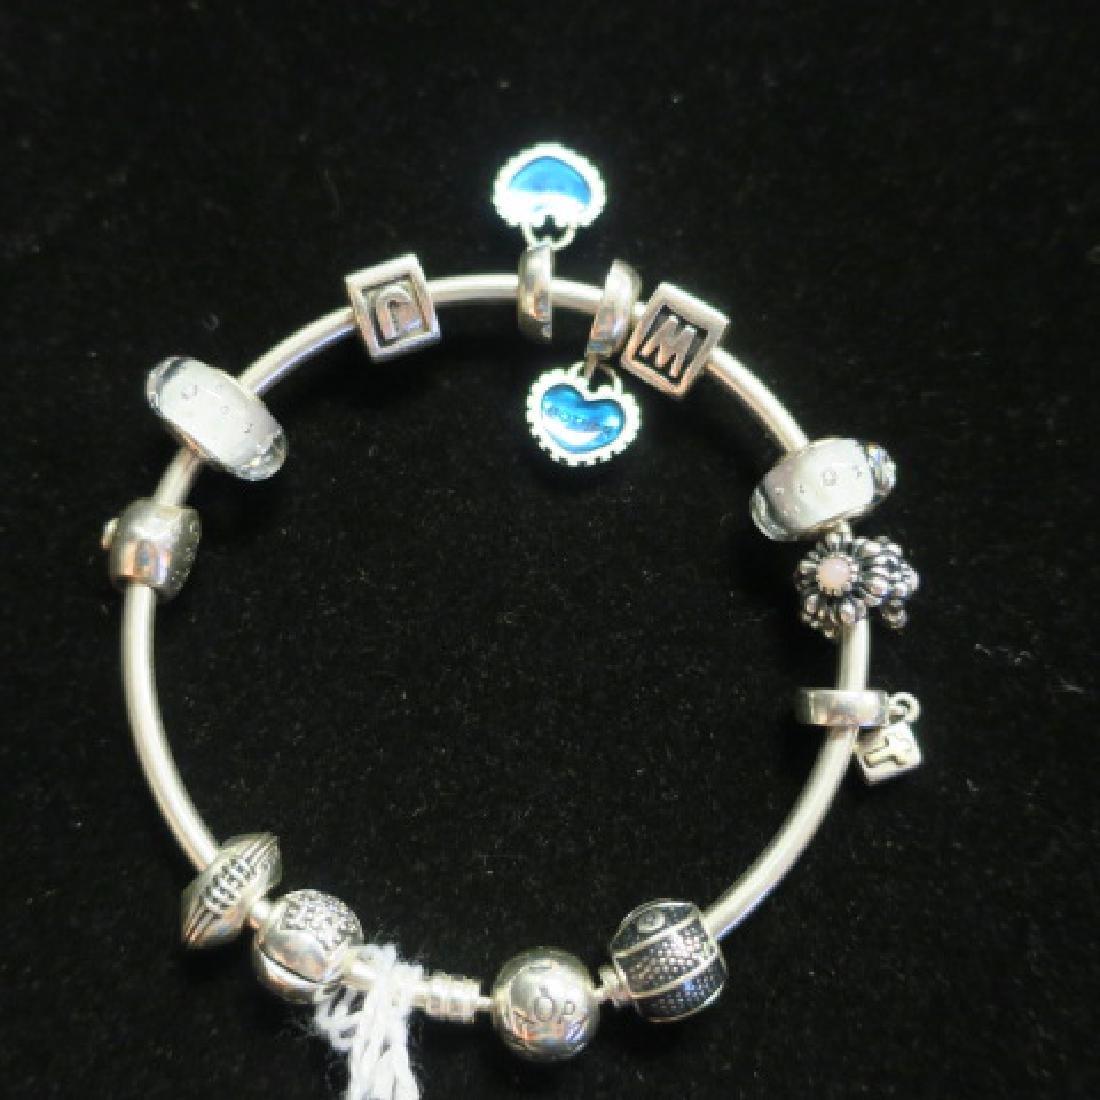 Hand Finished Bangle PANDORA Bracelet with Charms: